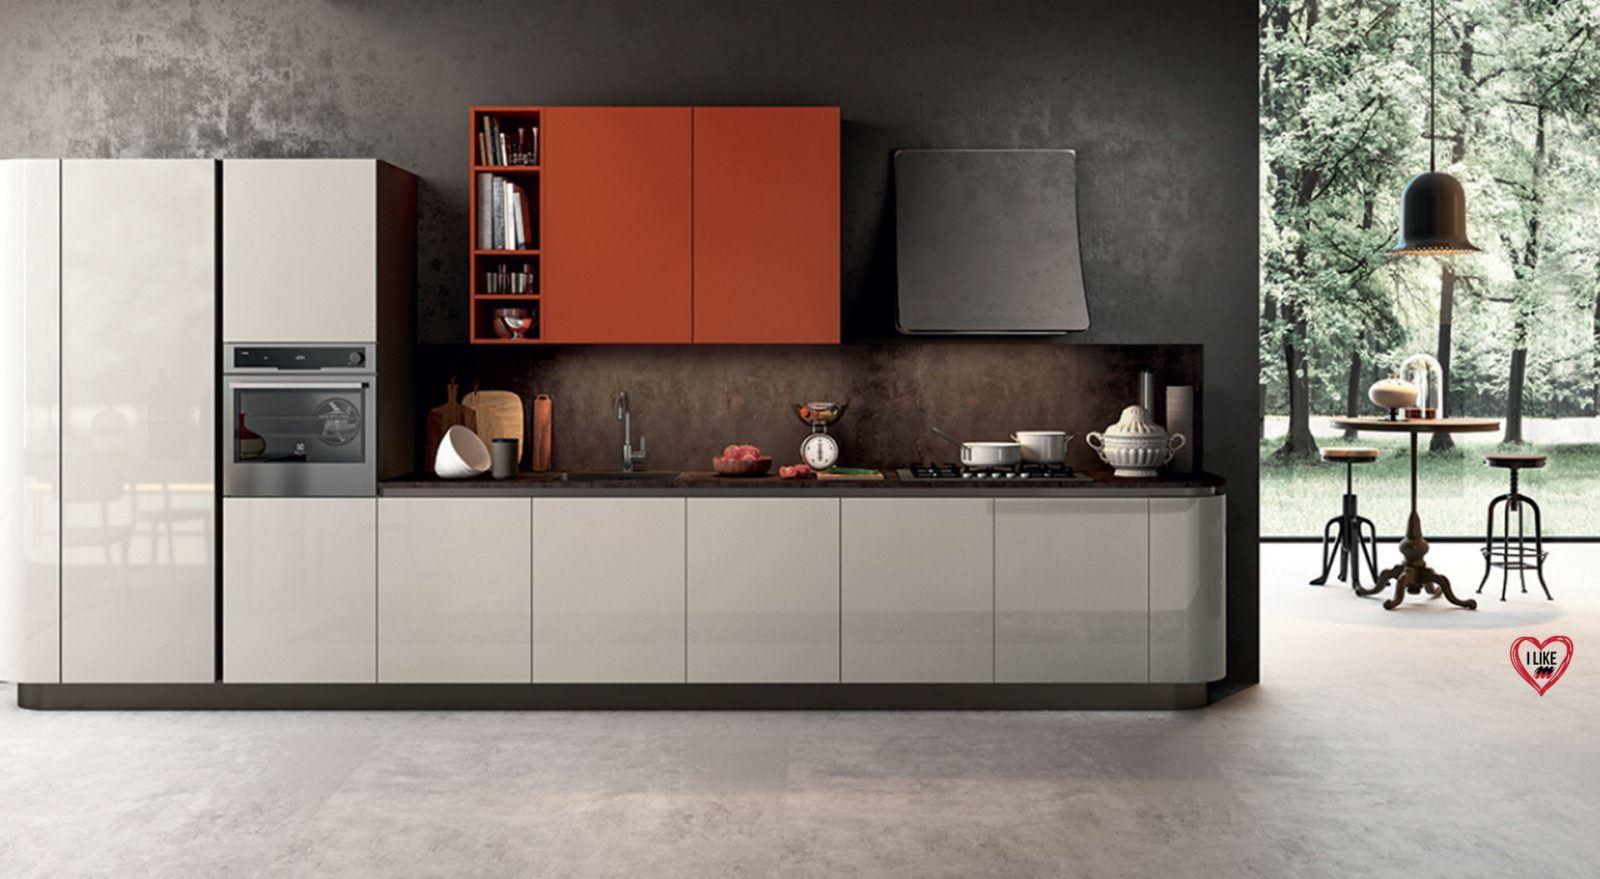 Cucine lineari moderne padova anche in offerta for Arredamento saldi